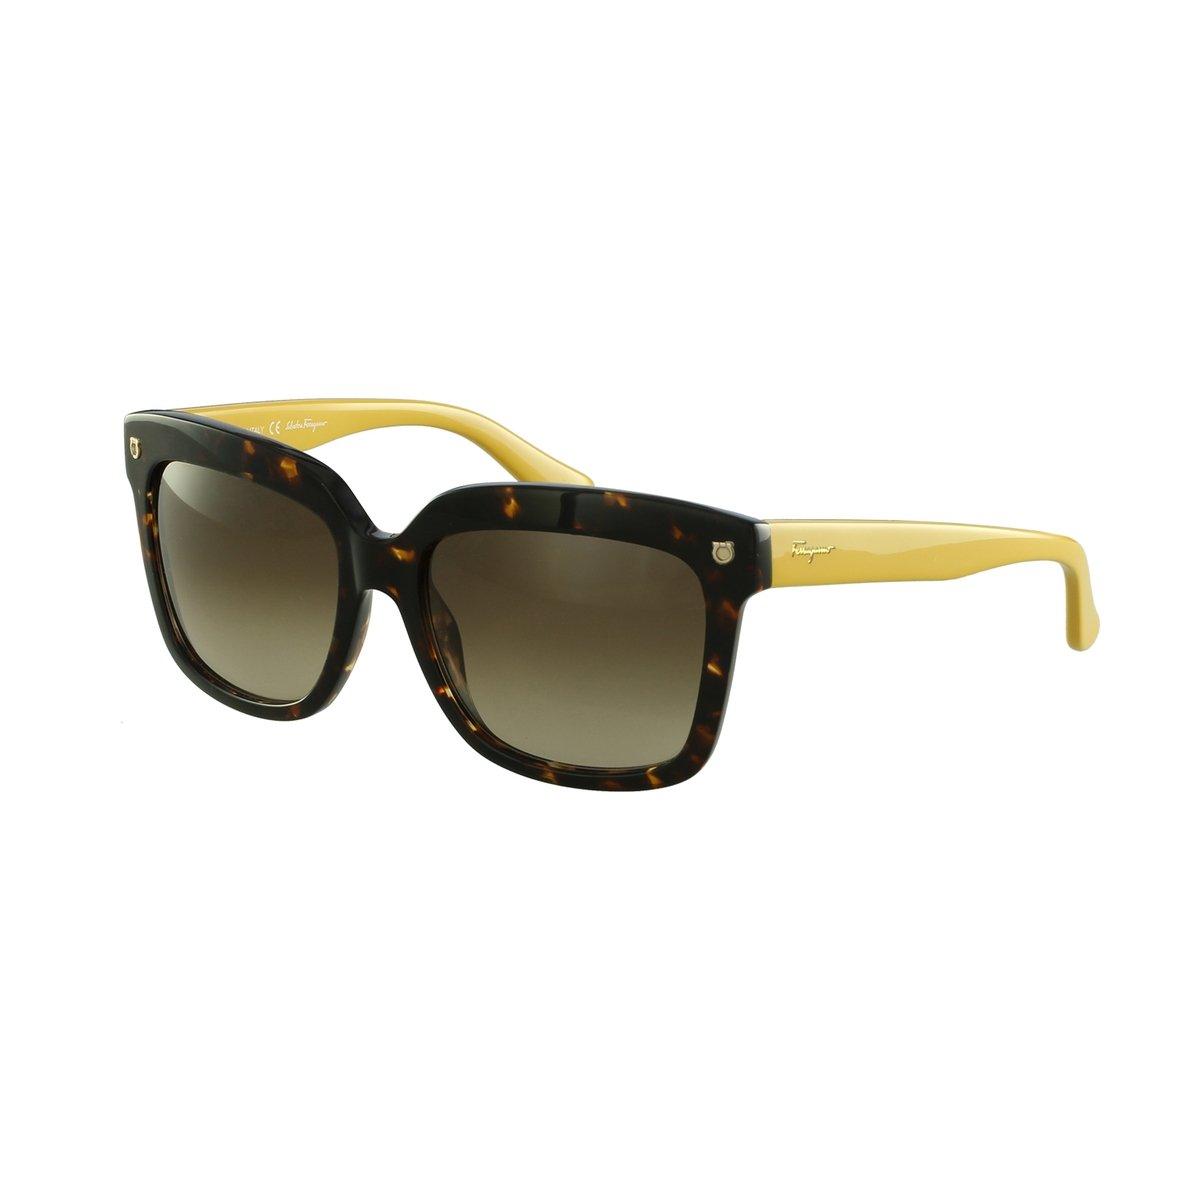 aaf9b5f087dc6 Óculos de Sol Salvatore Ferragamo Fashion Marrom - Compre Agora ...